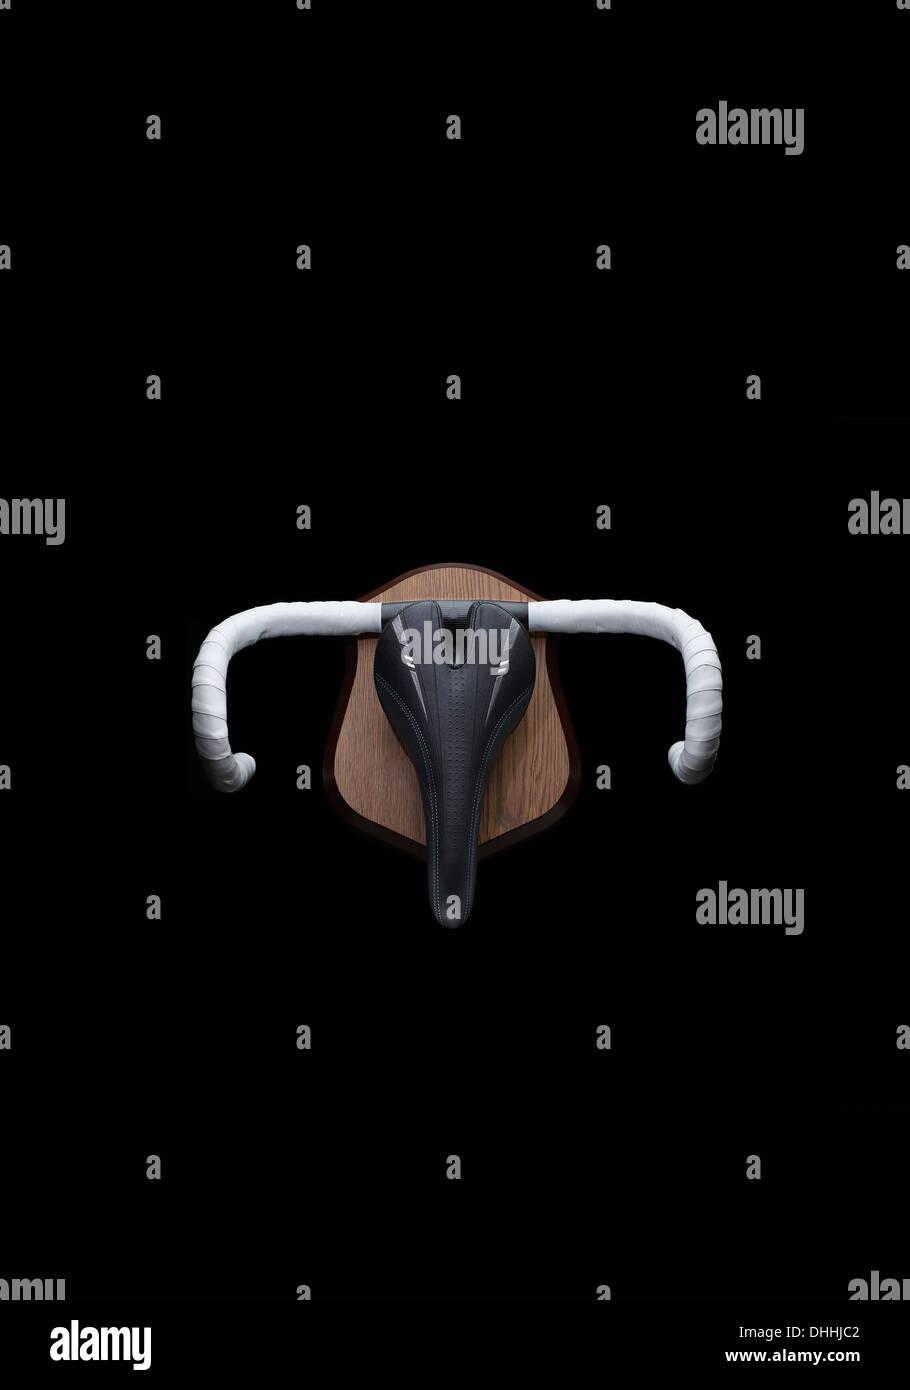 Still life of racing bike trophy with handlebars and saddle - Stock Image